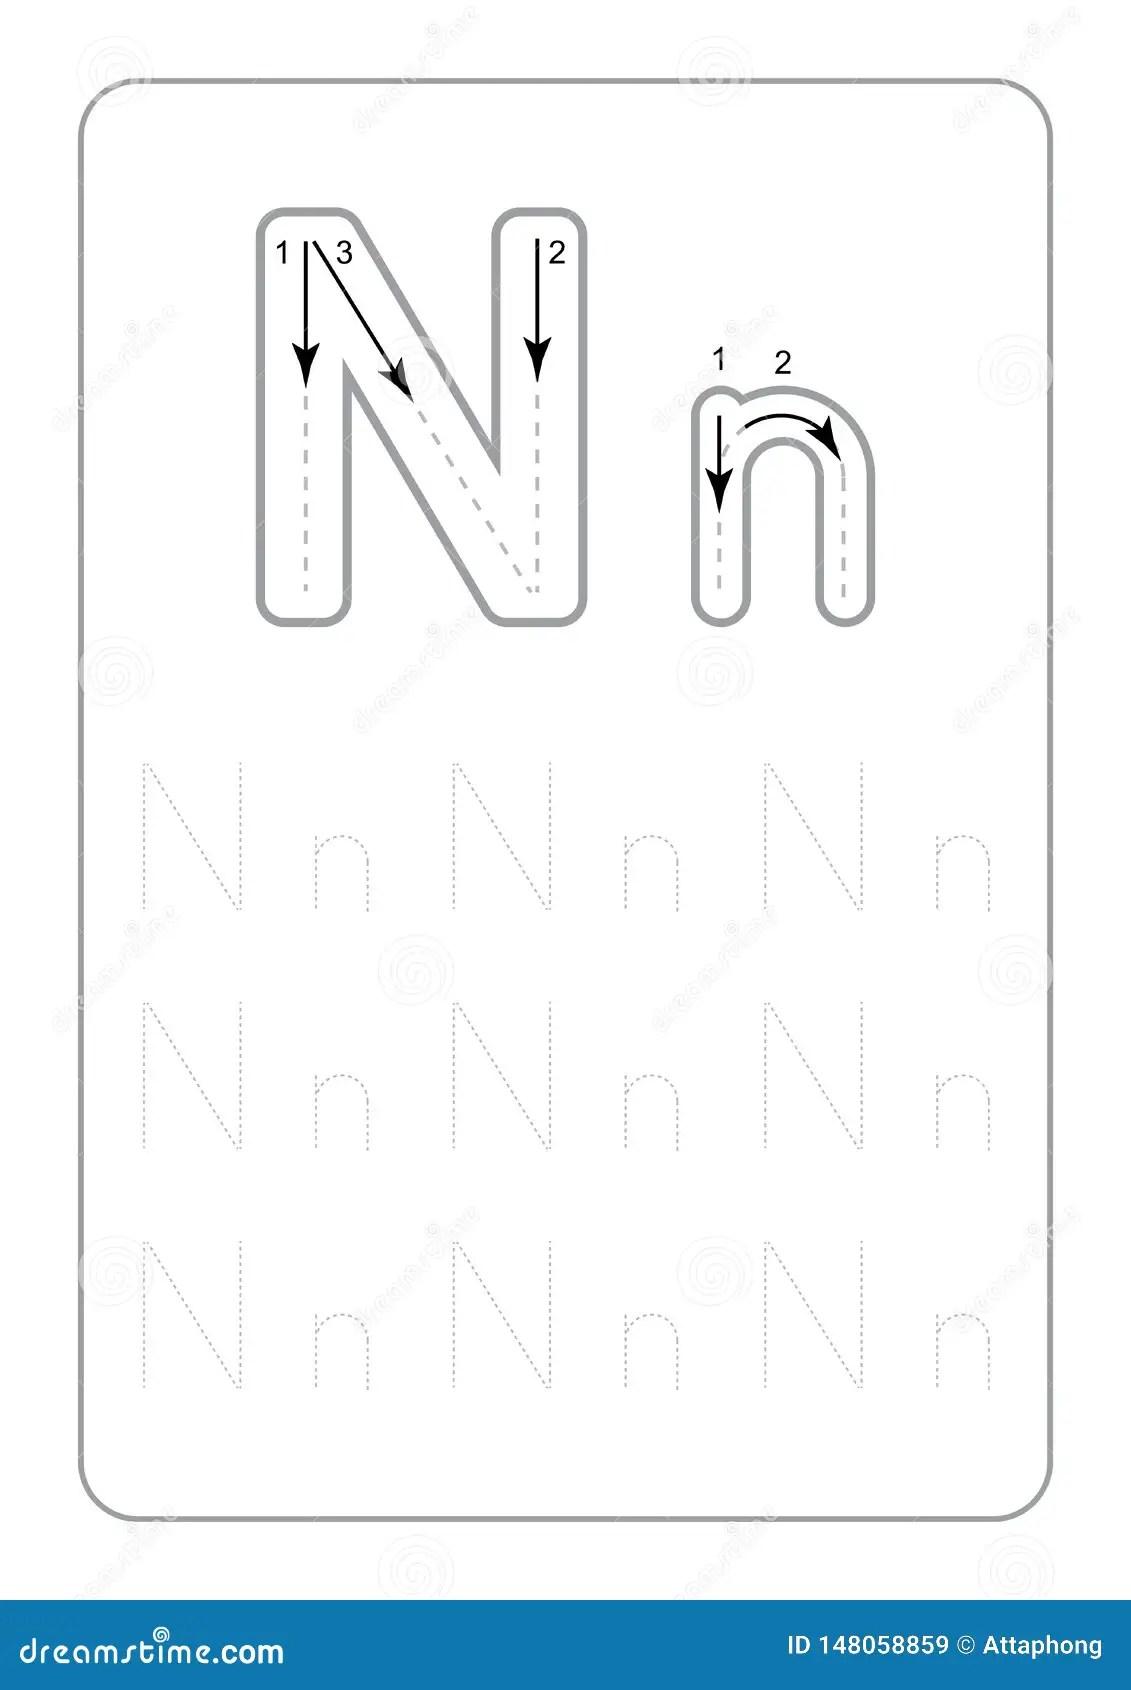 Kindergarten Tracing Letters Worksheets Monochrome Tracing